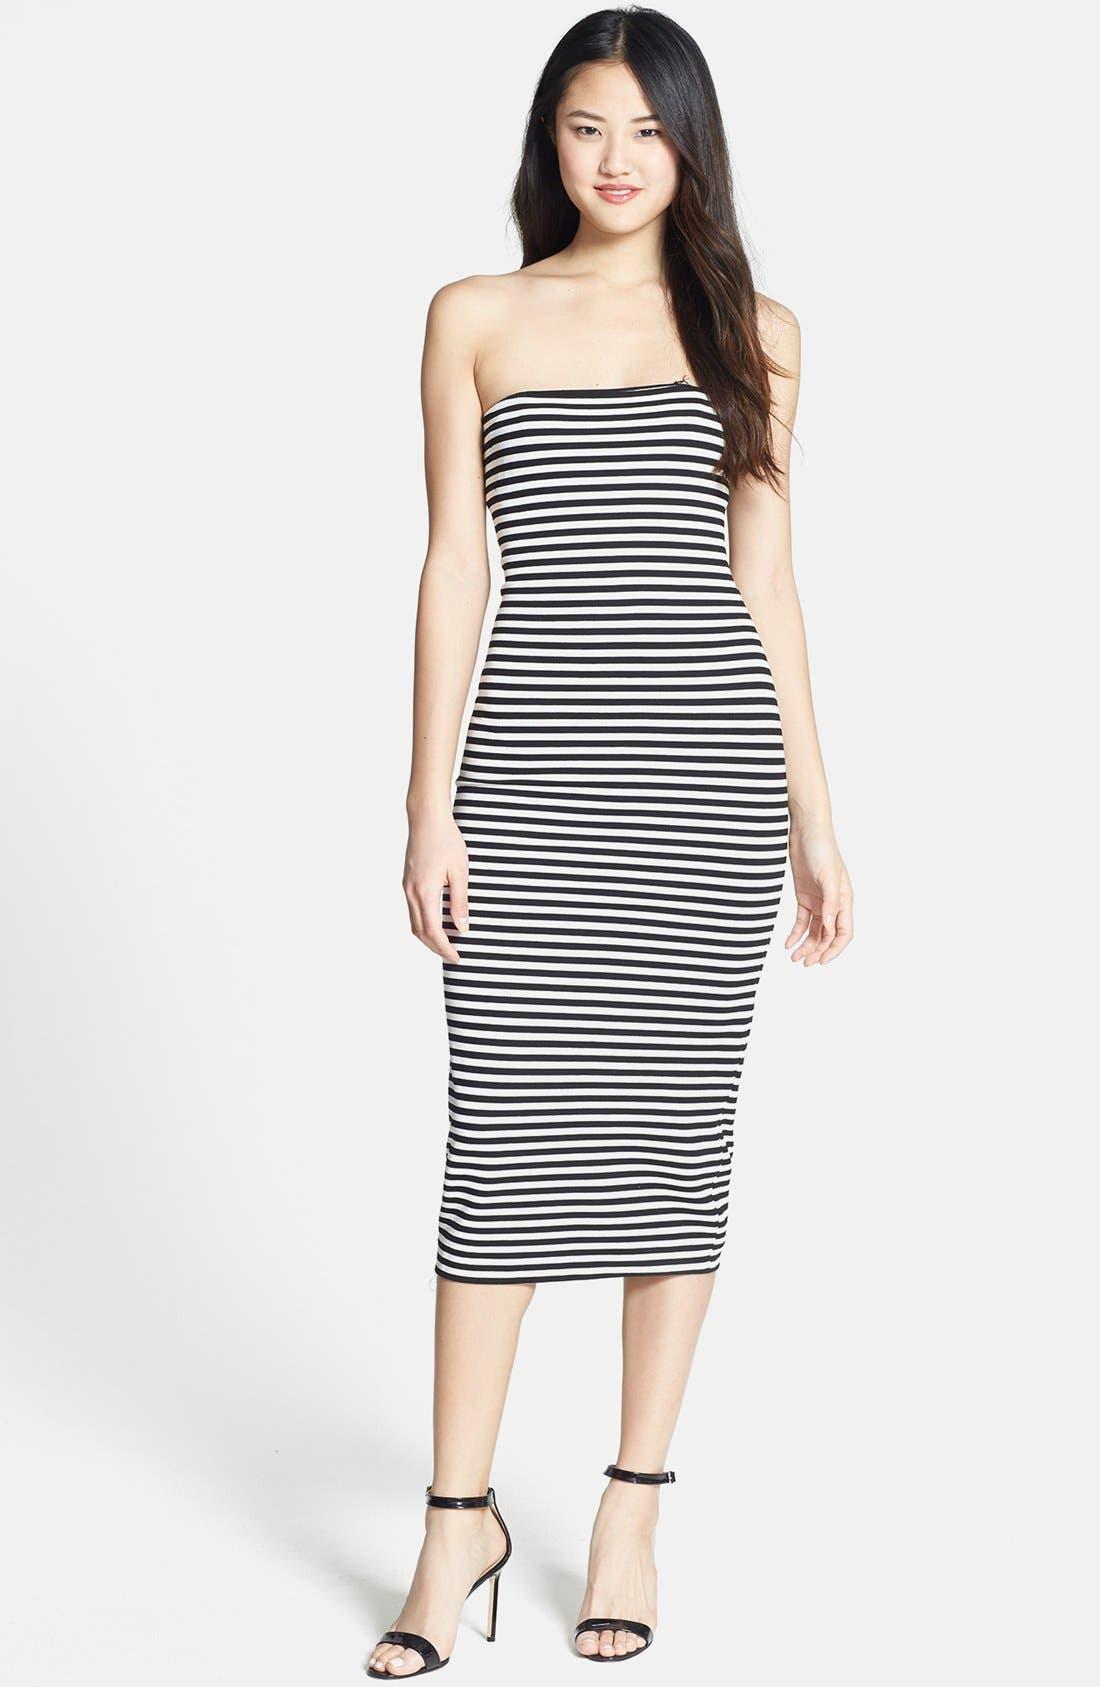 Alternate Image 1 Selected - Nicole Miller Stripe Strapless Ponte Knit Body-Con Dress